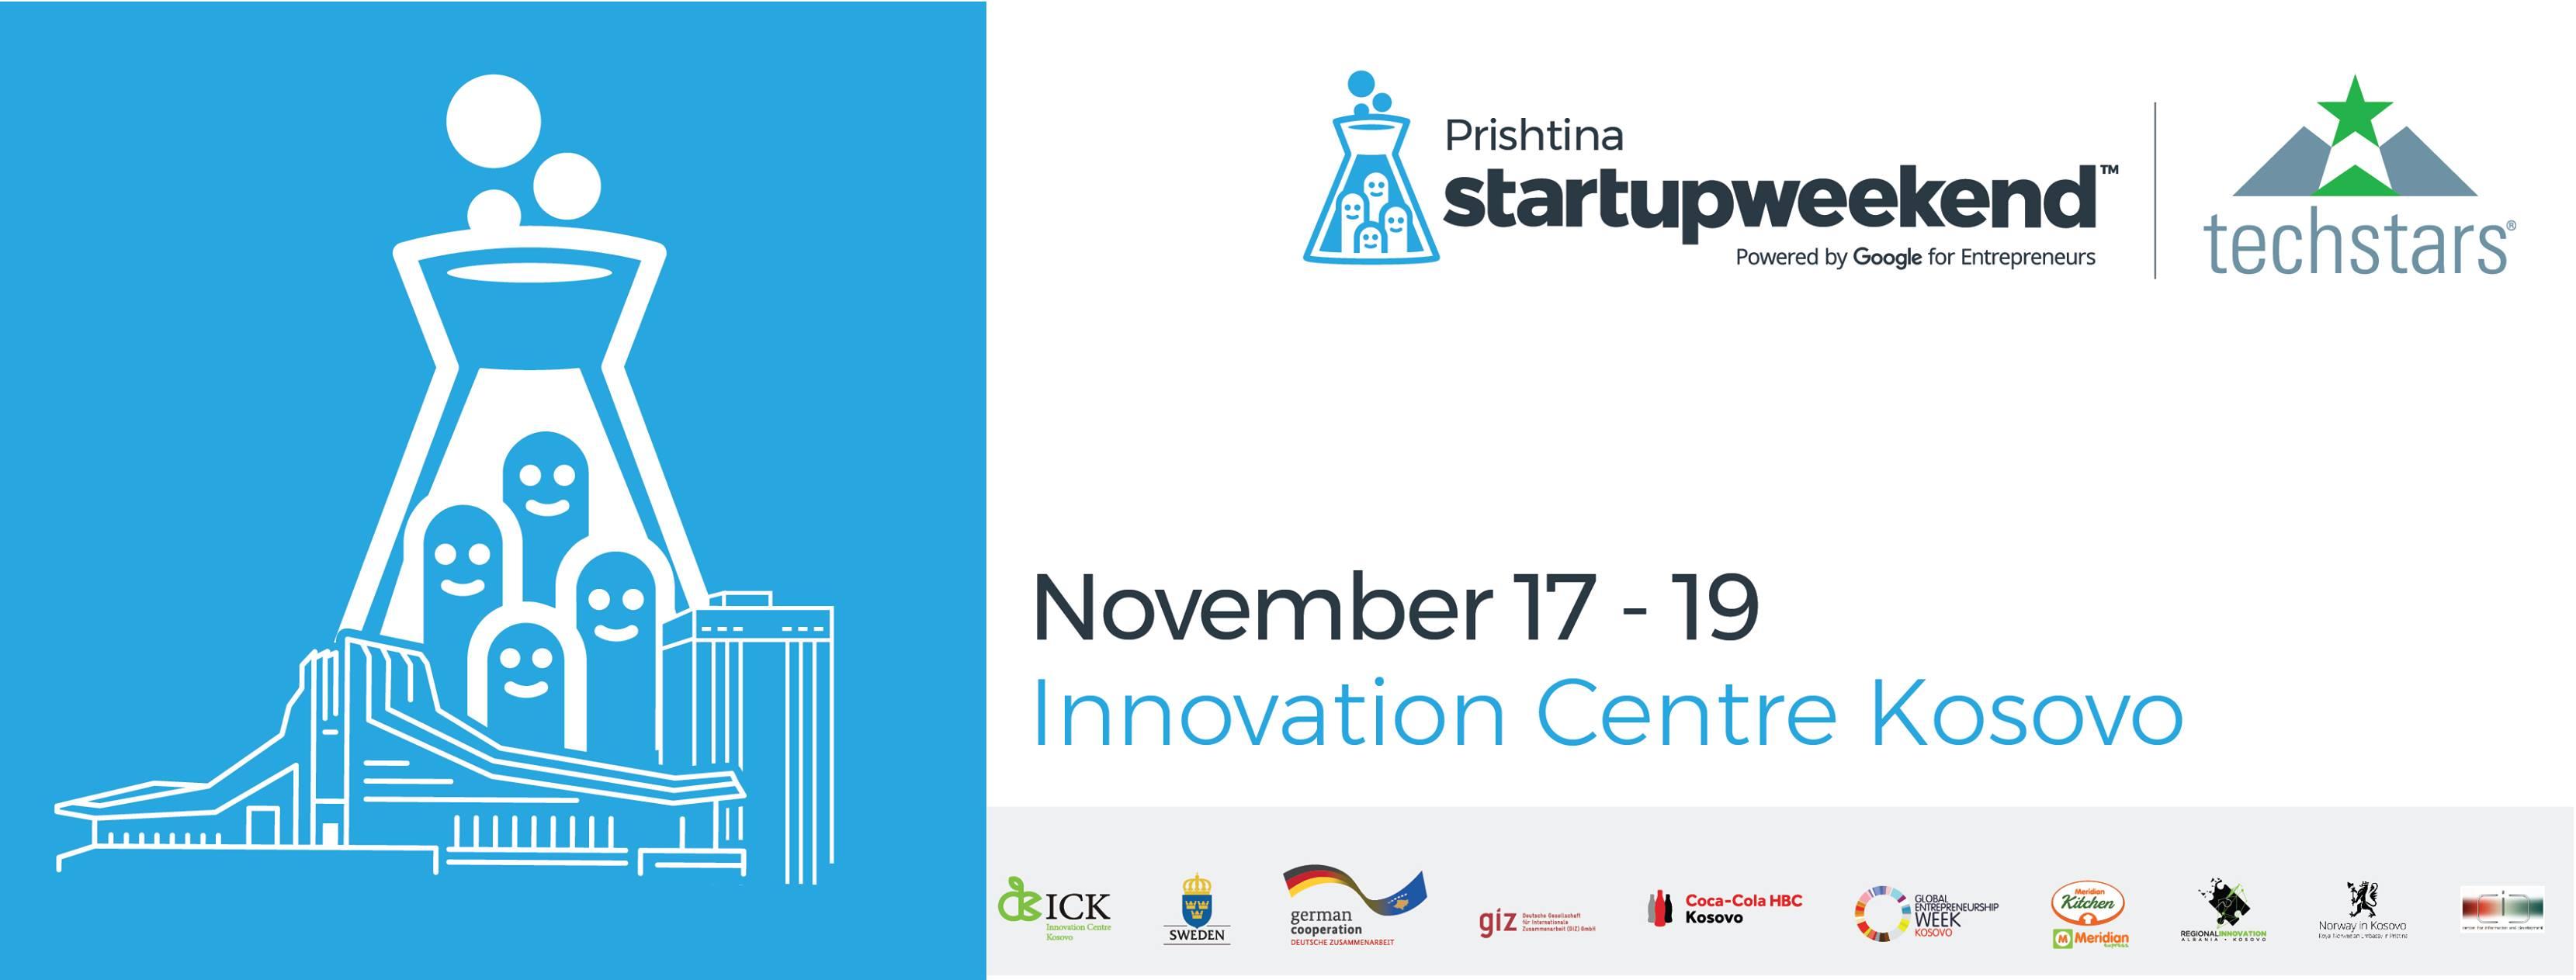 Startup Weekend Prishtina 2017